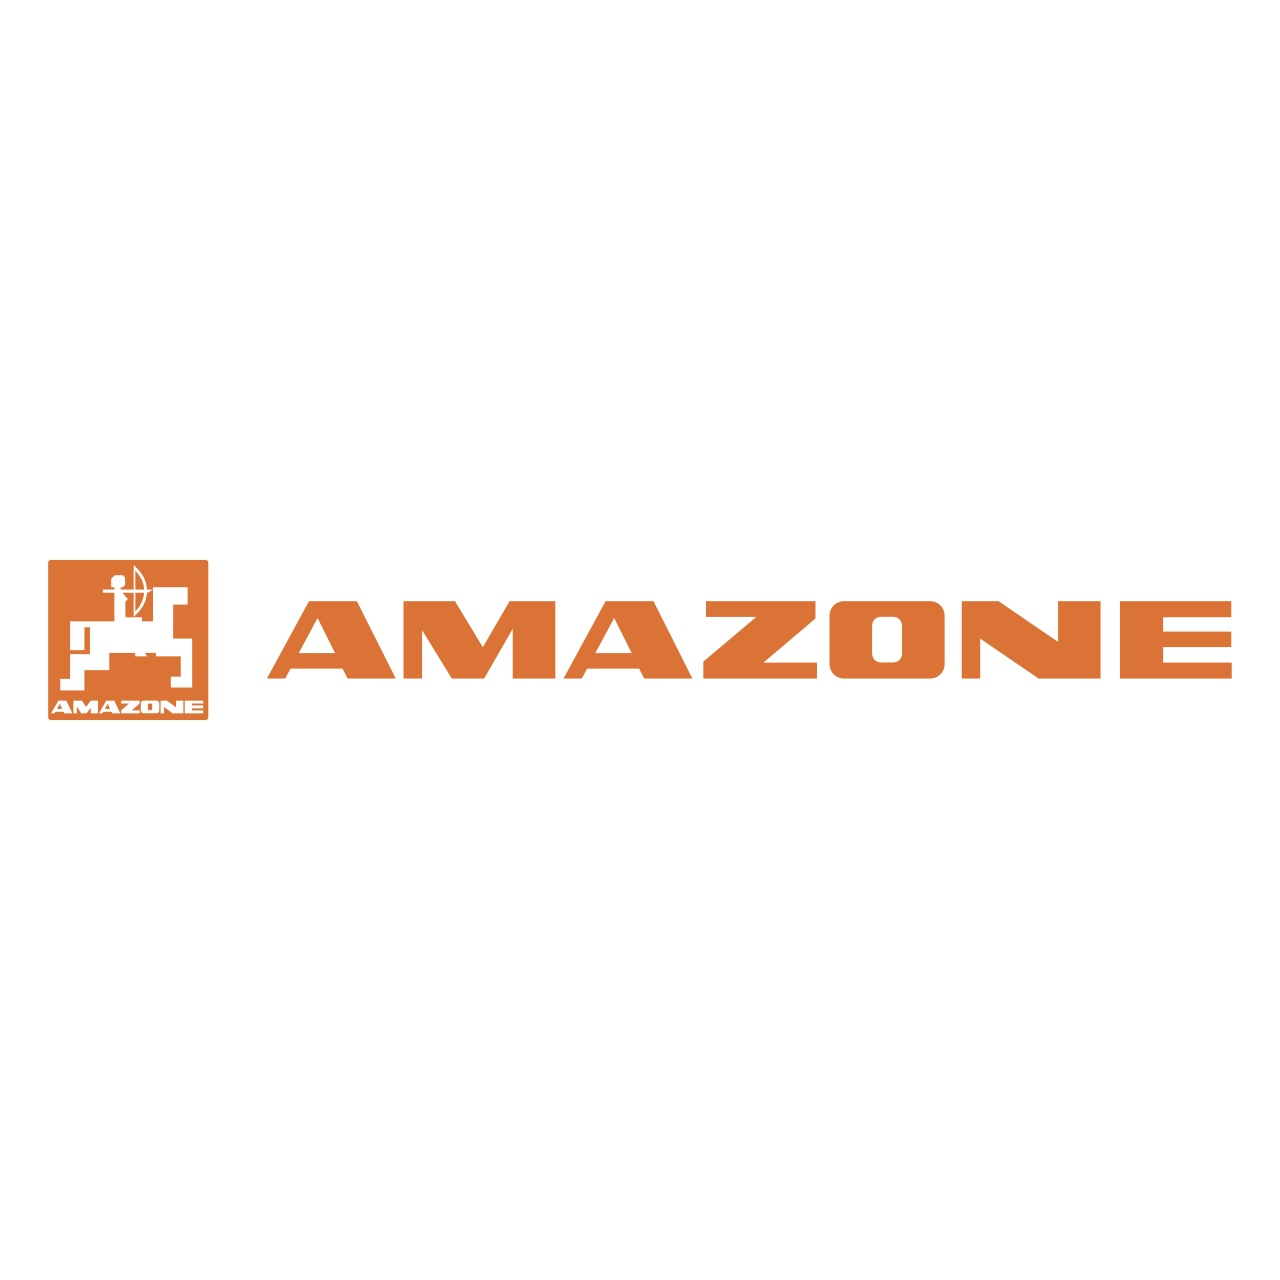 Amazone 948190 934176